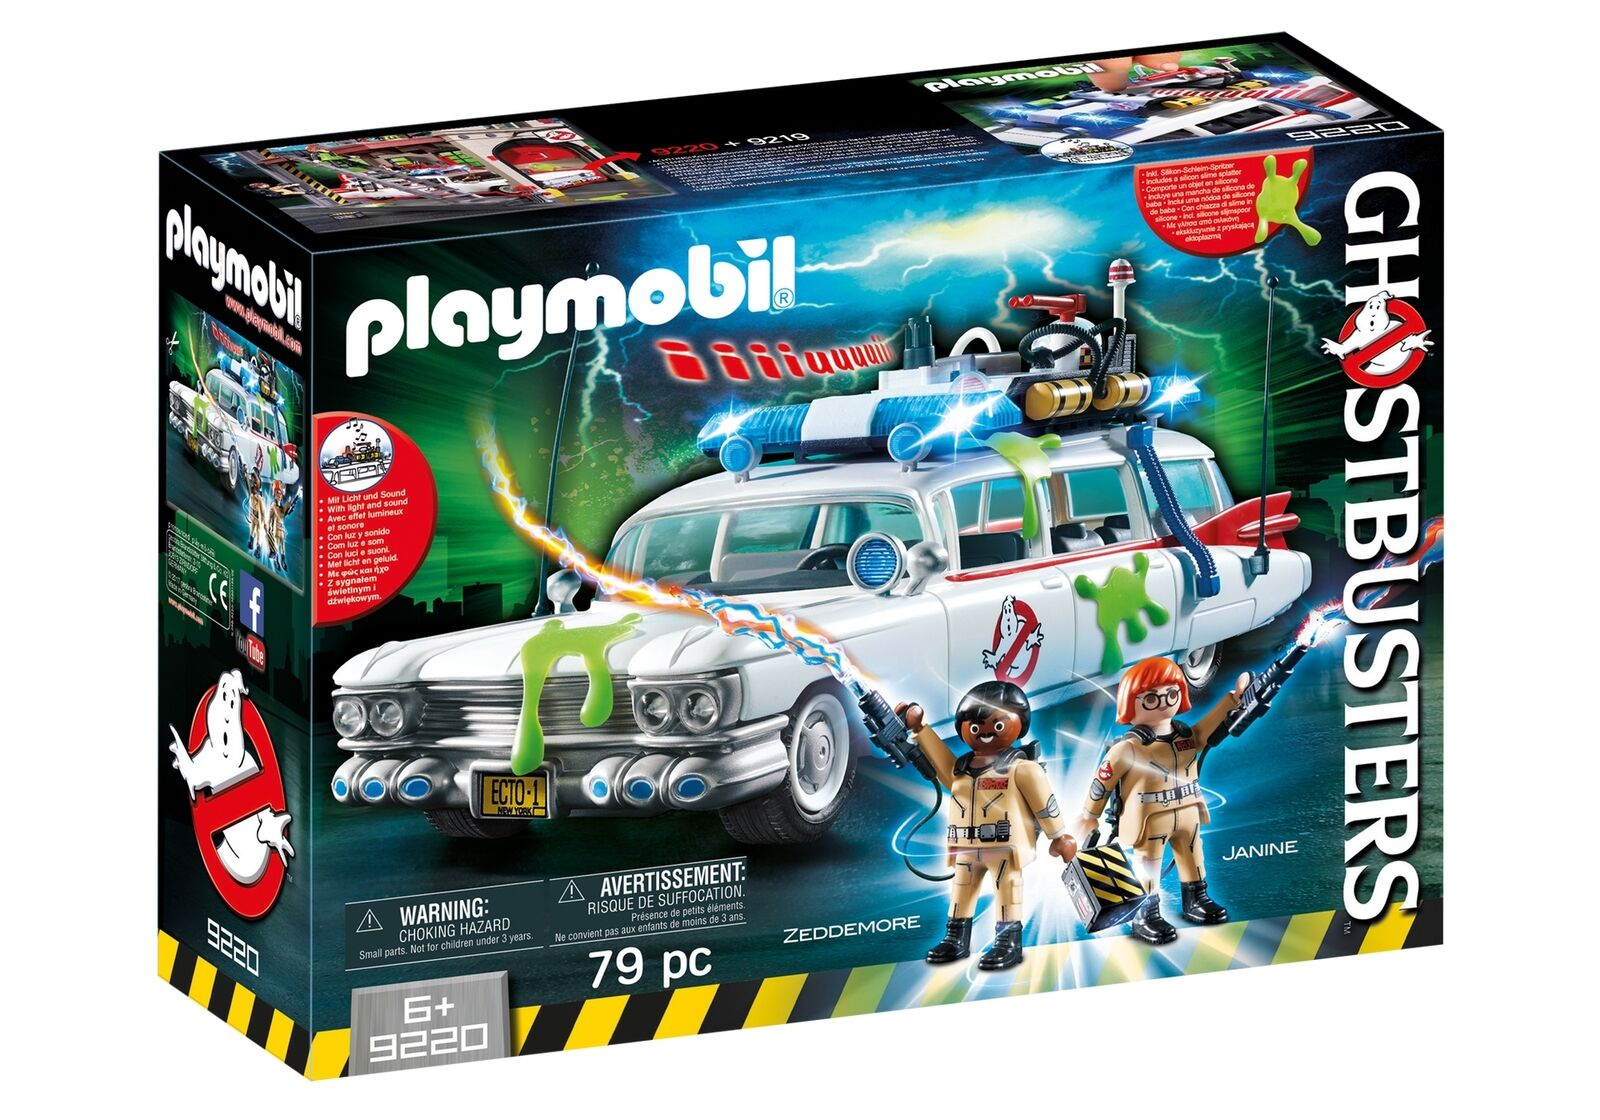 Playmobil 9220 Ghostbusters Ecto-1 Autolicht & Klang- Inc Figuren Winston Janine